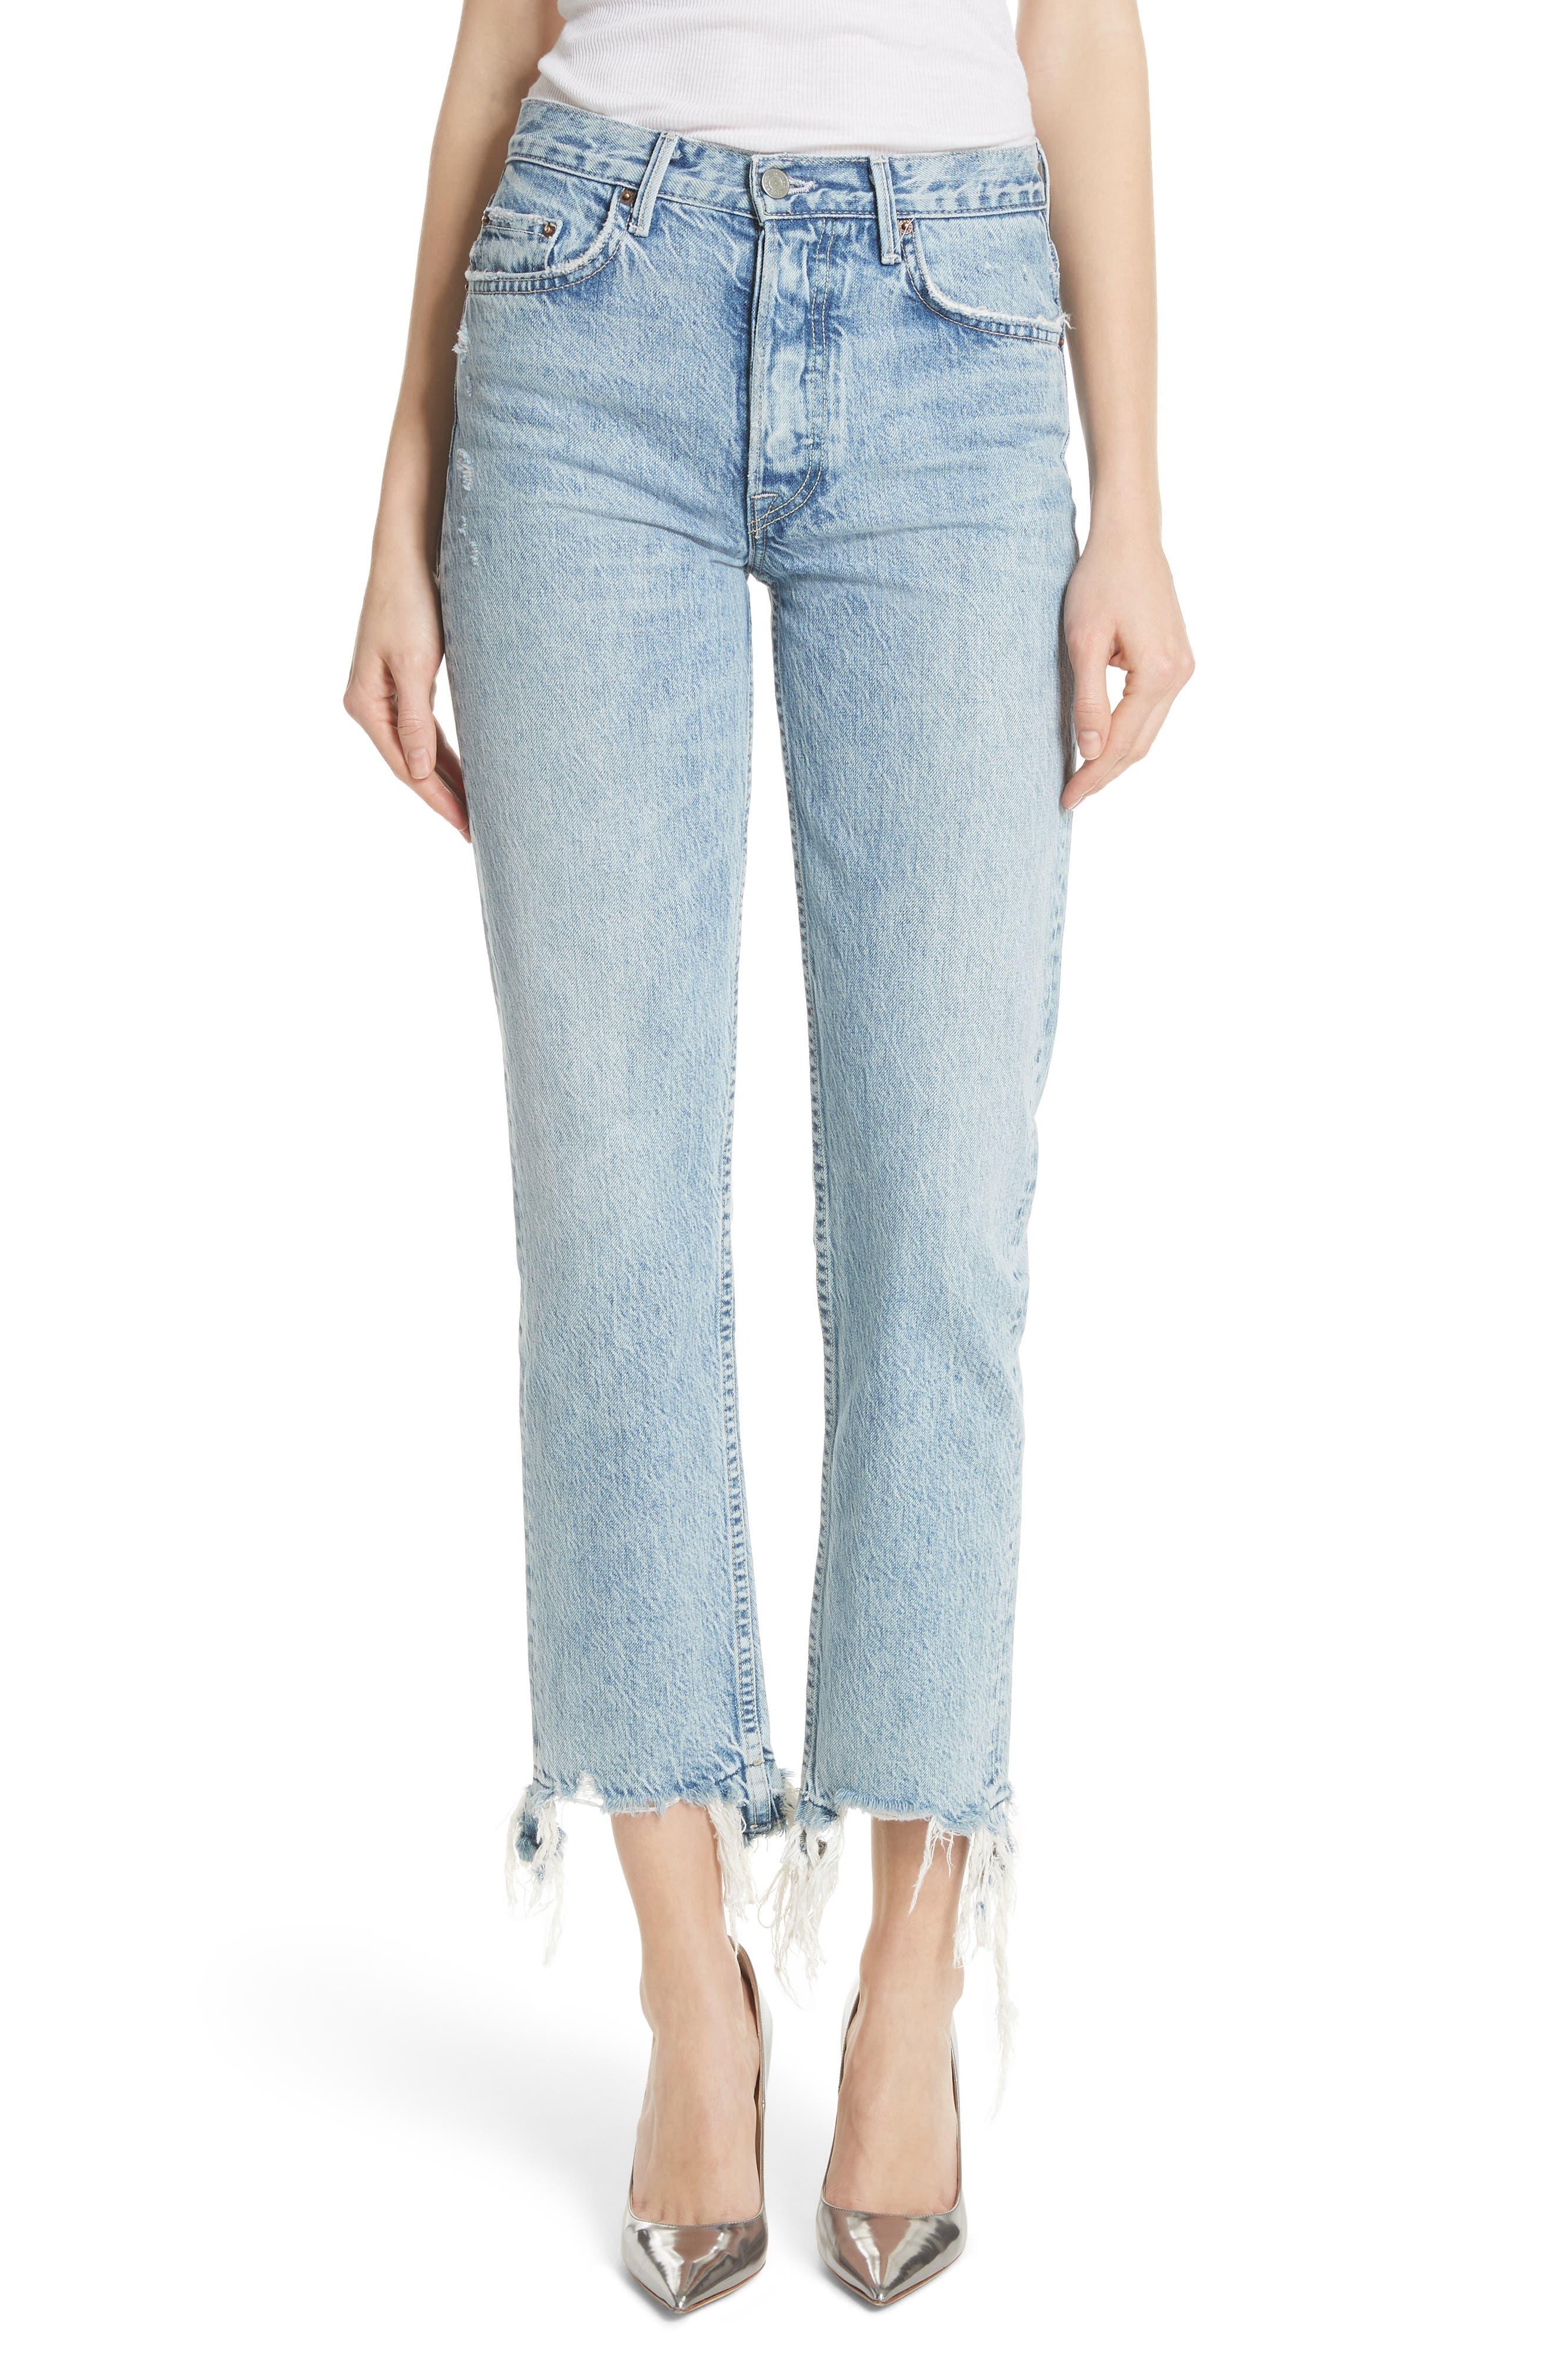 GRLFRND, Helena Frayed Hem High Waist Jeans, Main thumbnail 1, color, 401